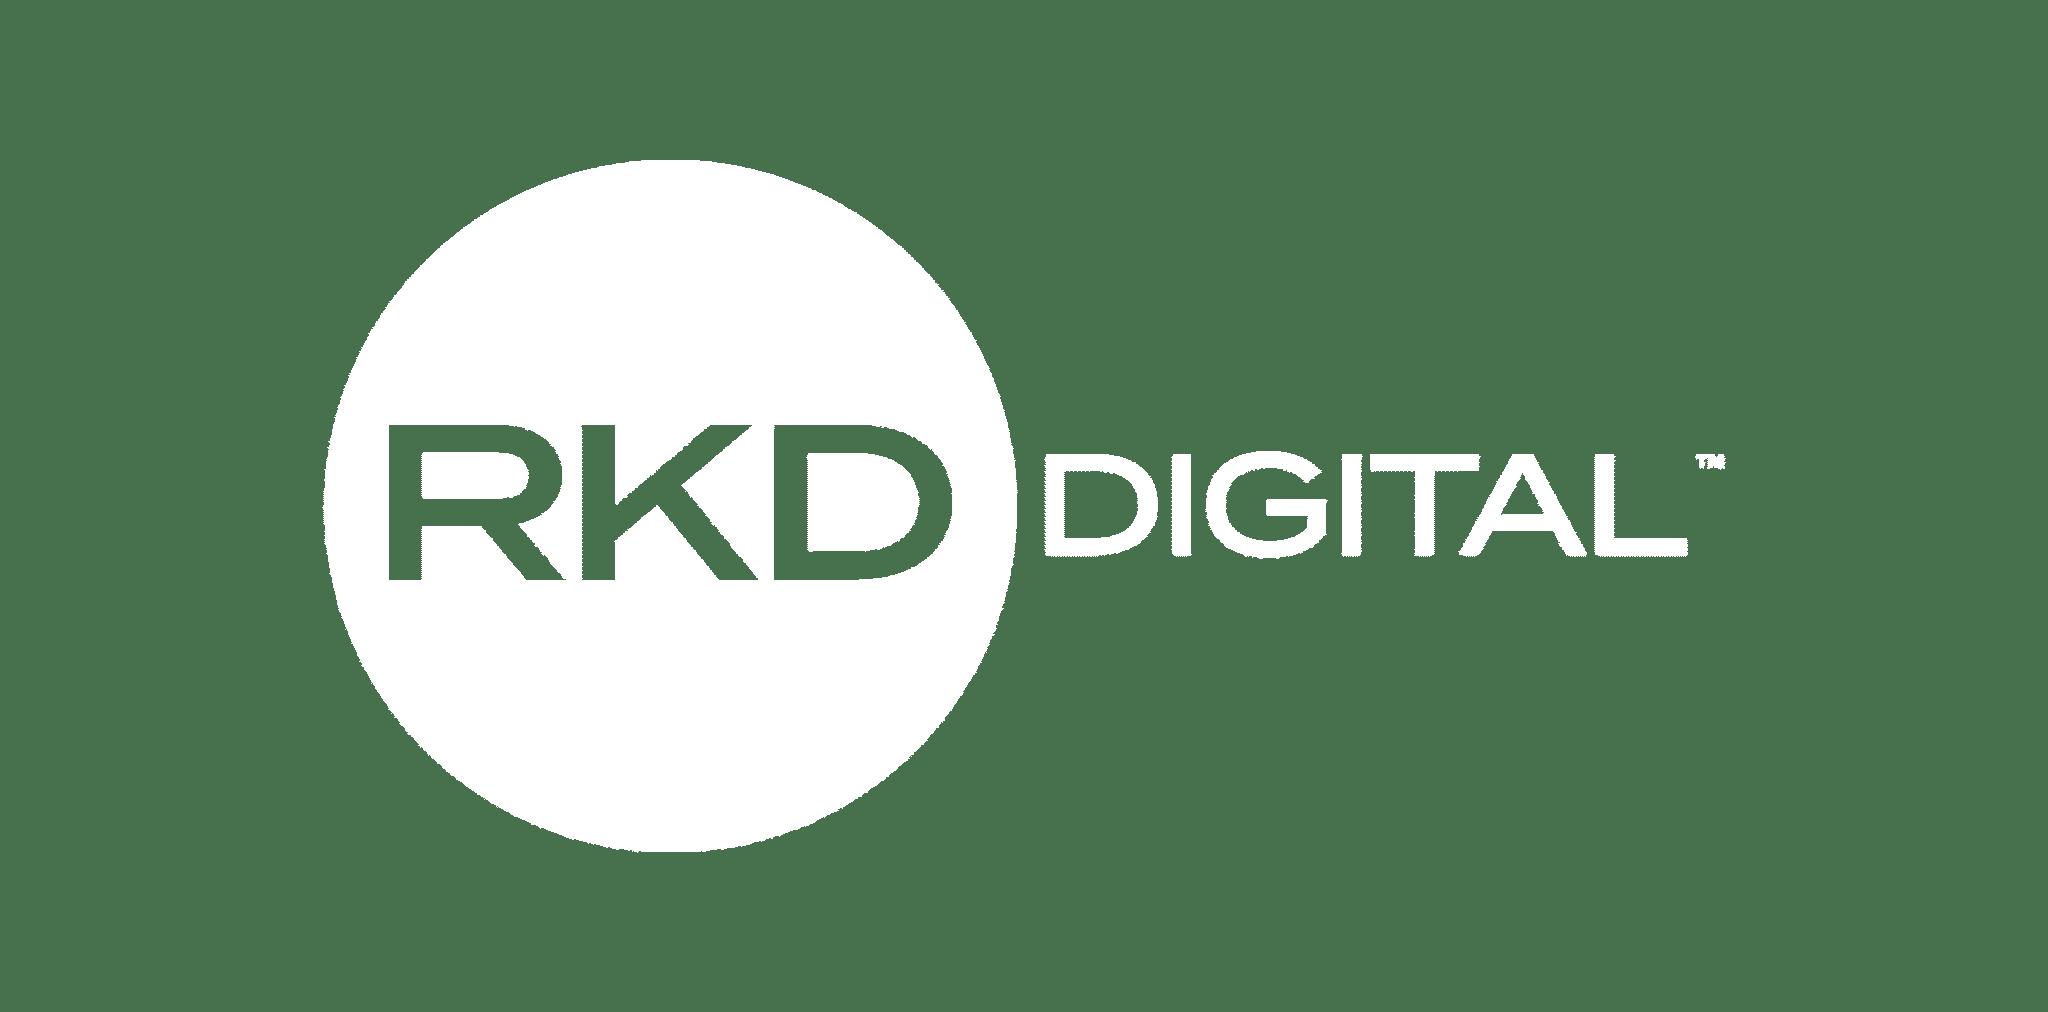 RKD Digital Logo